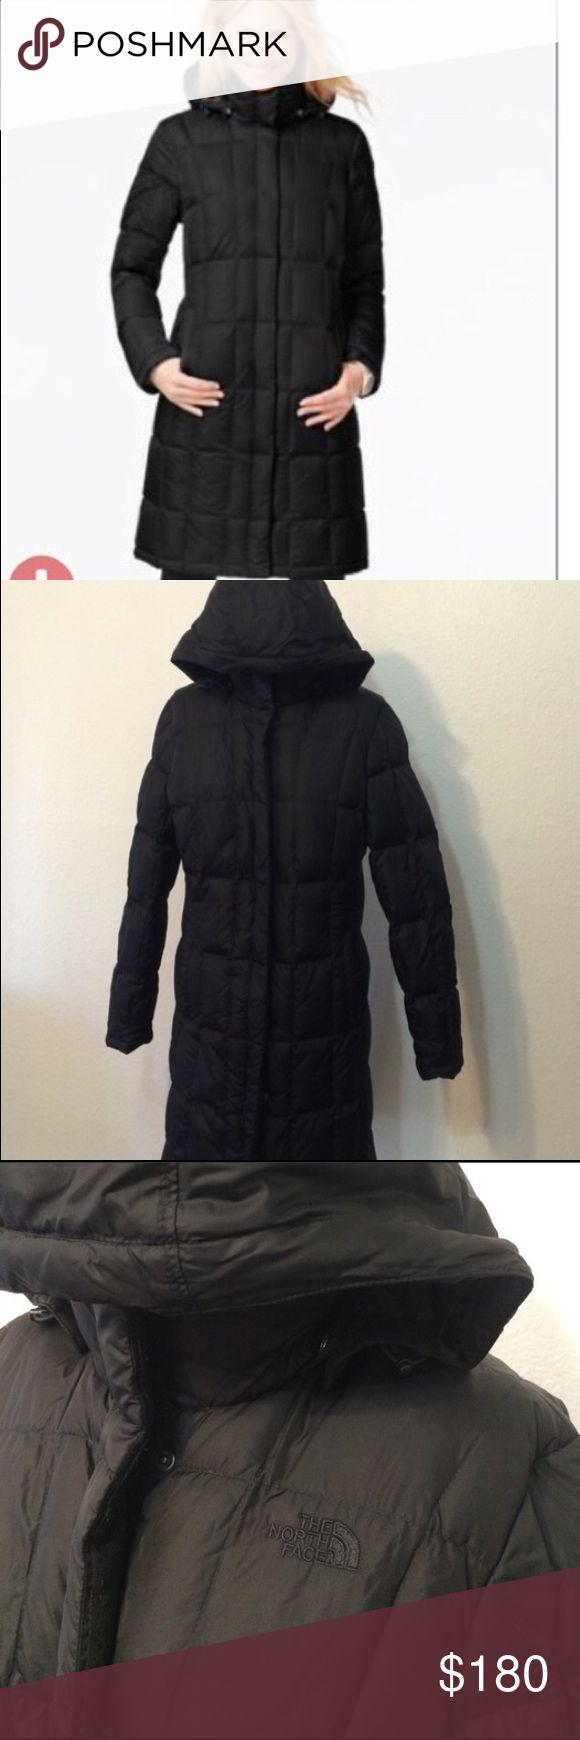 North Face Gotham down parka North Face Gotham down parka. EUC. North Face Jackets & Coats Puffers